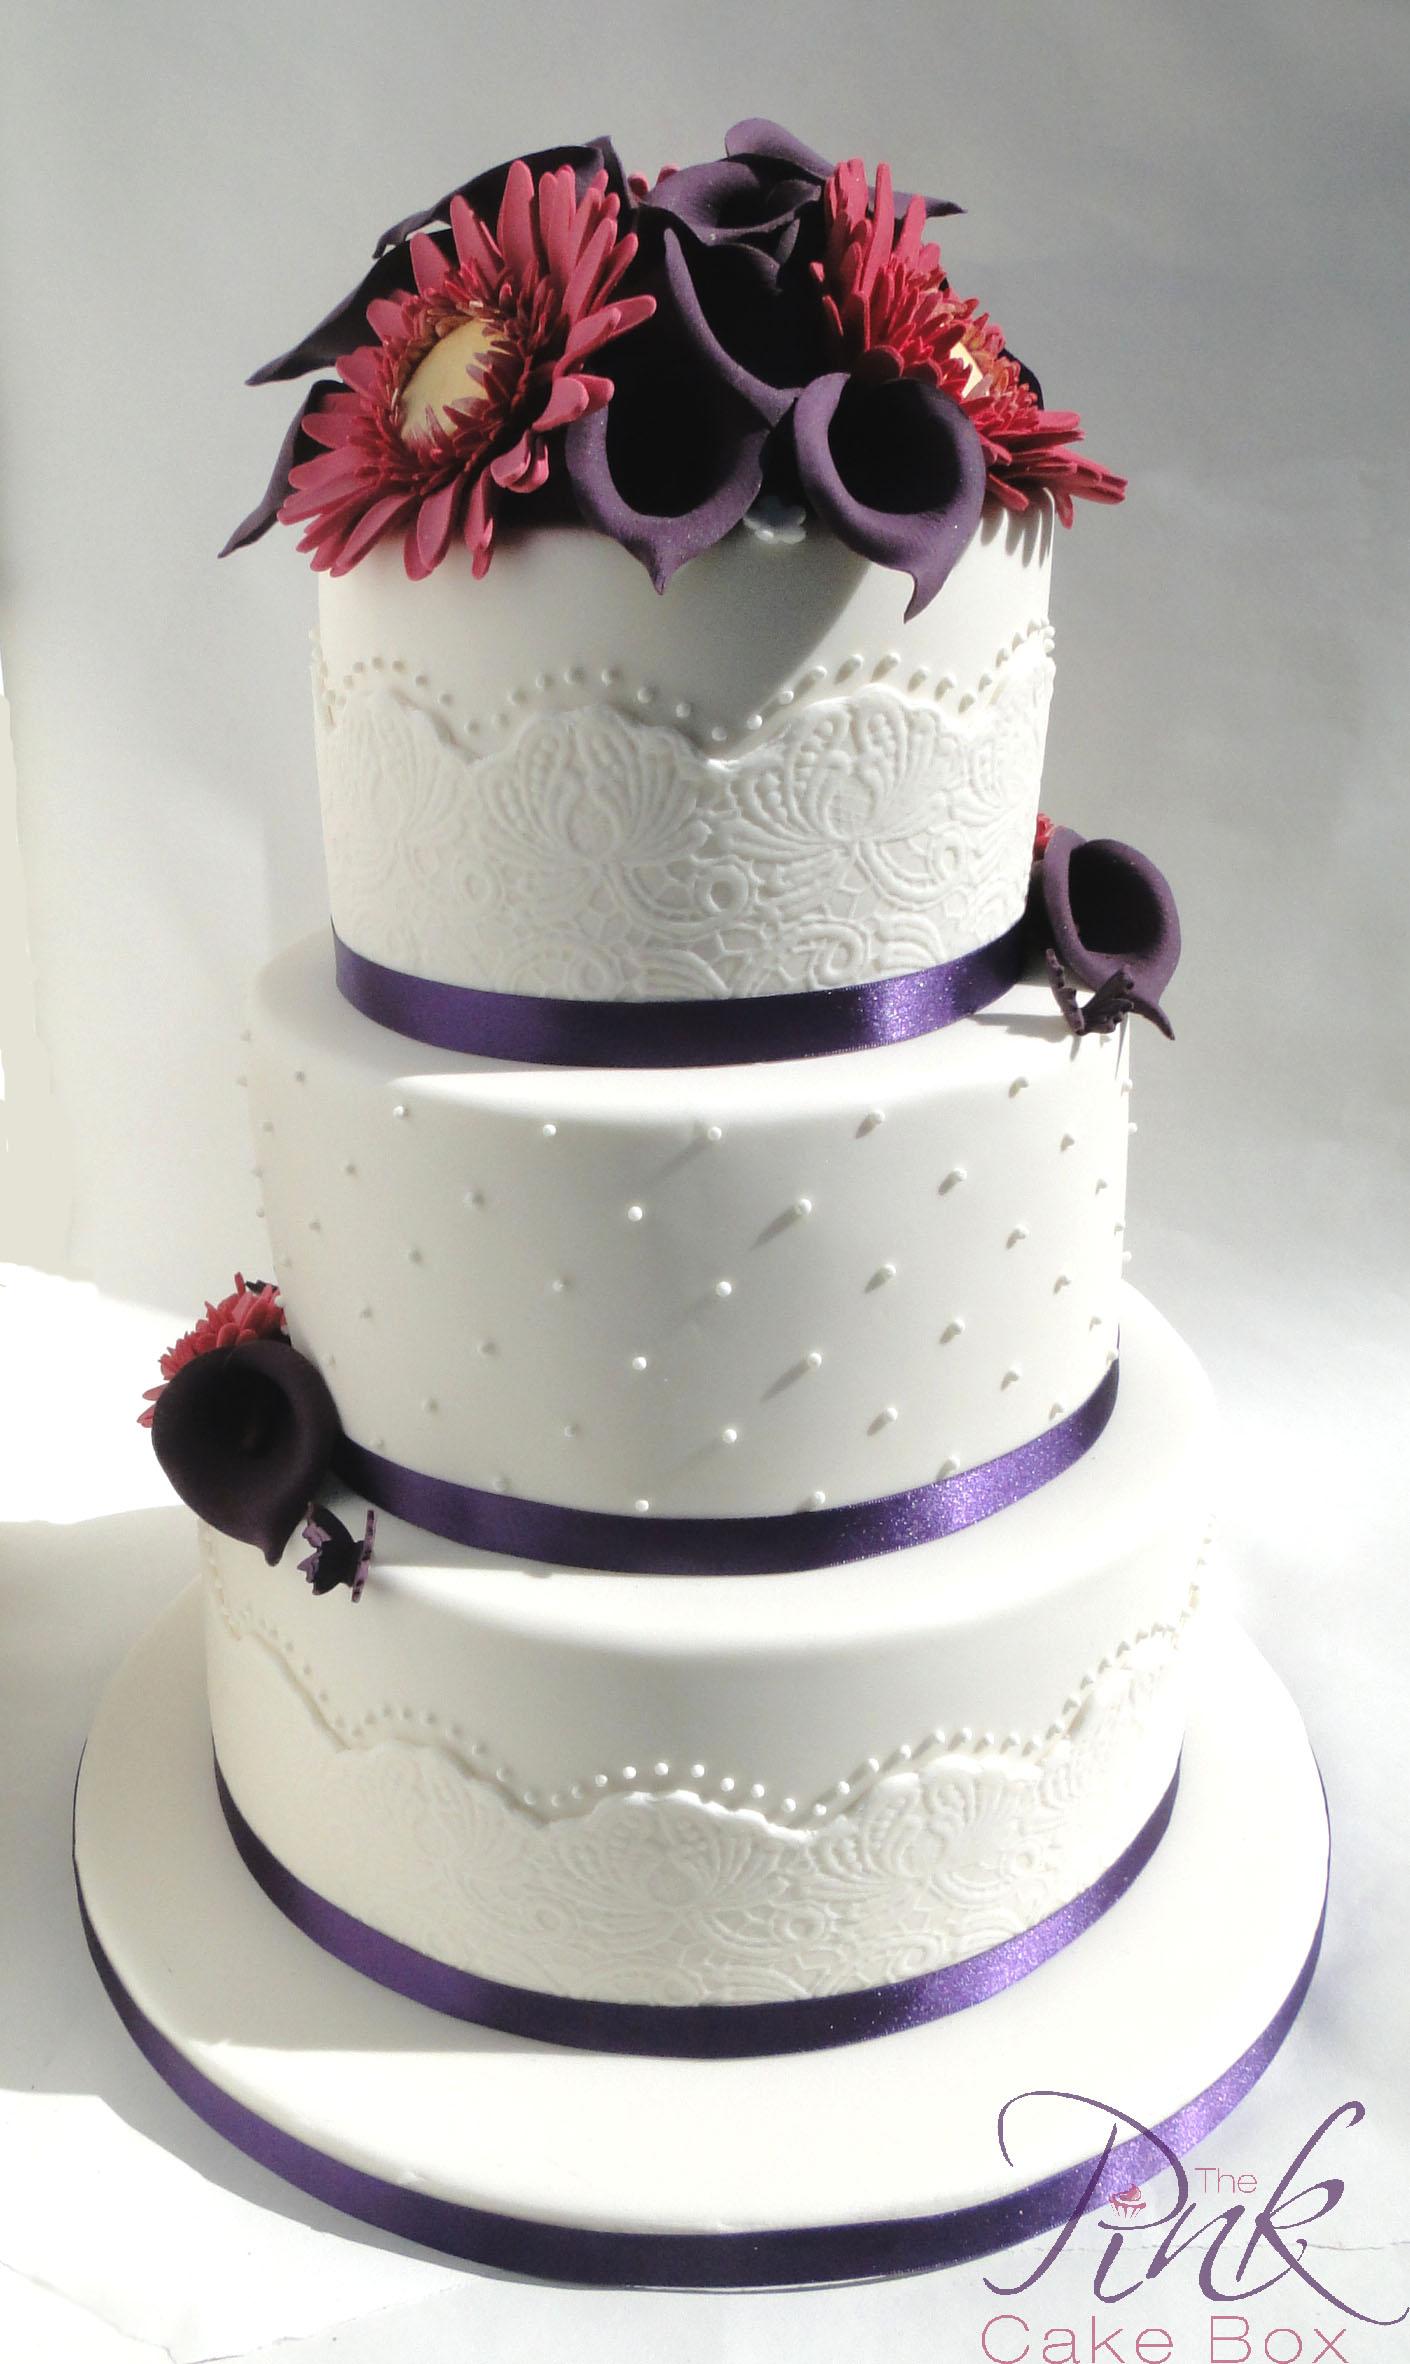 Old Fashioned Wedding Cakes Markham Gallery - The Wedding Ideas ...